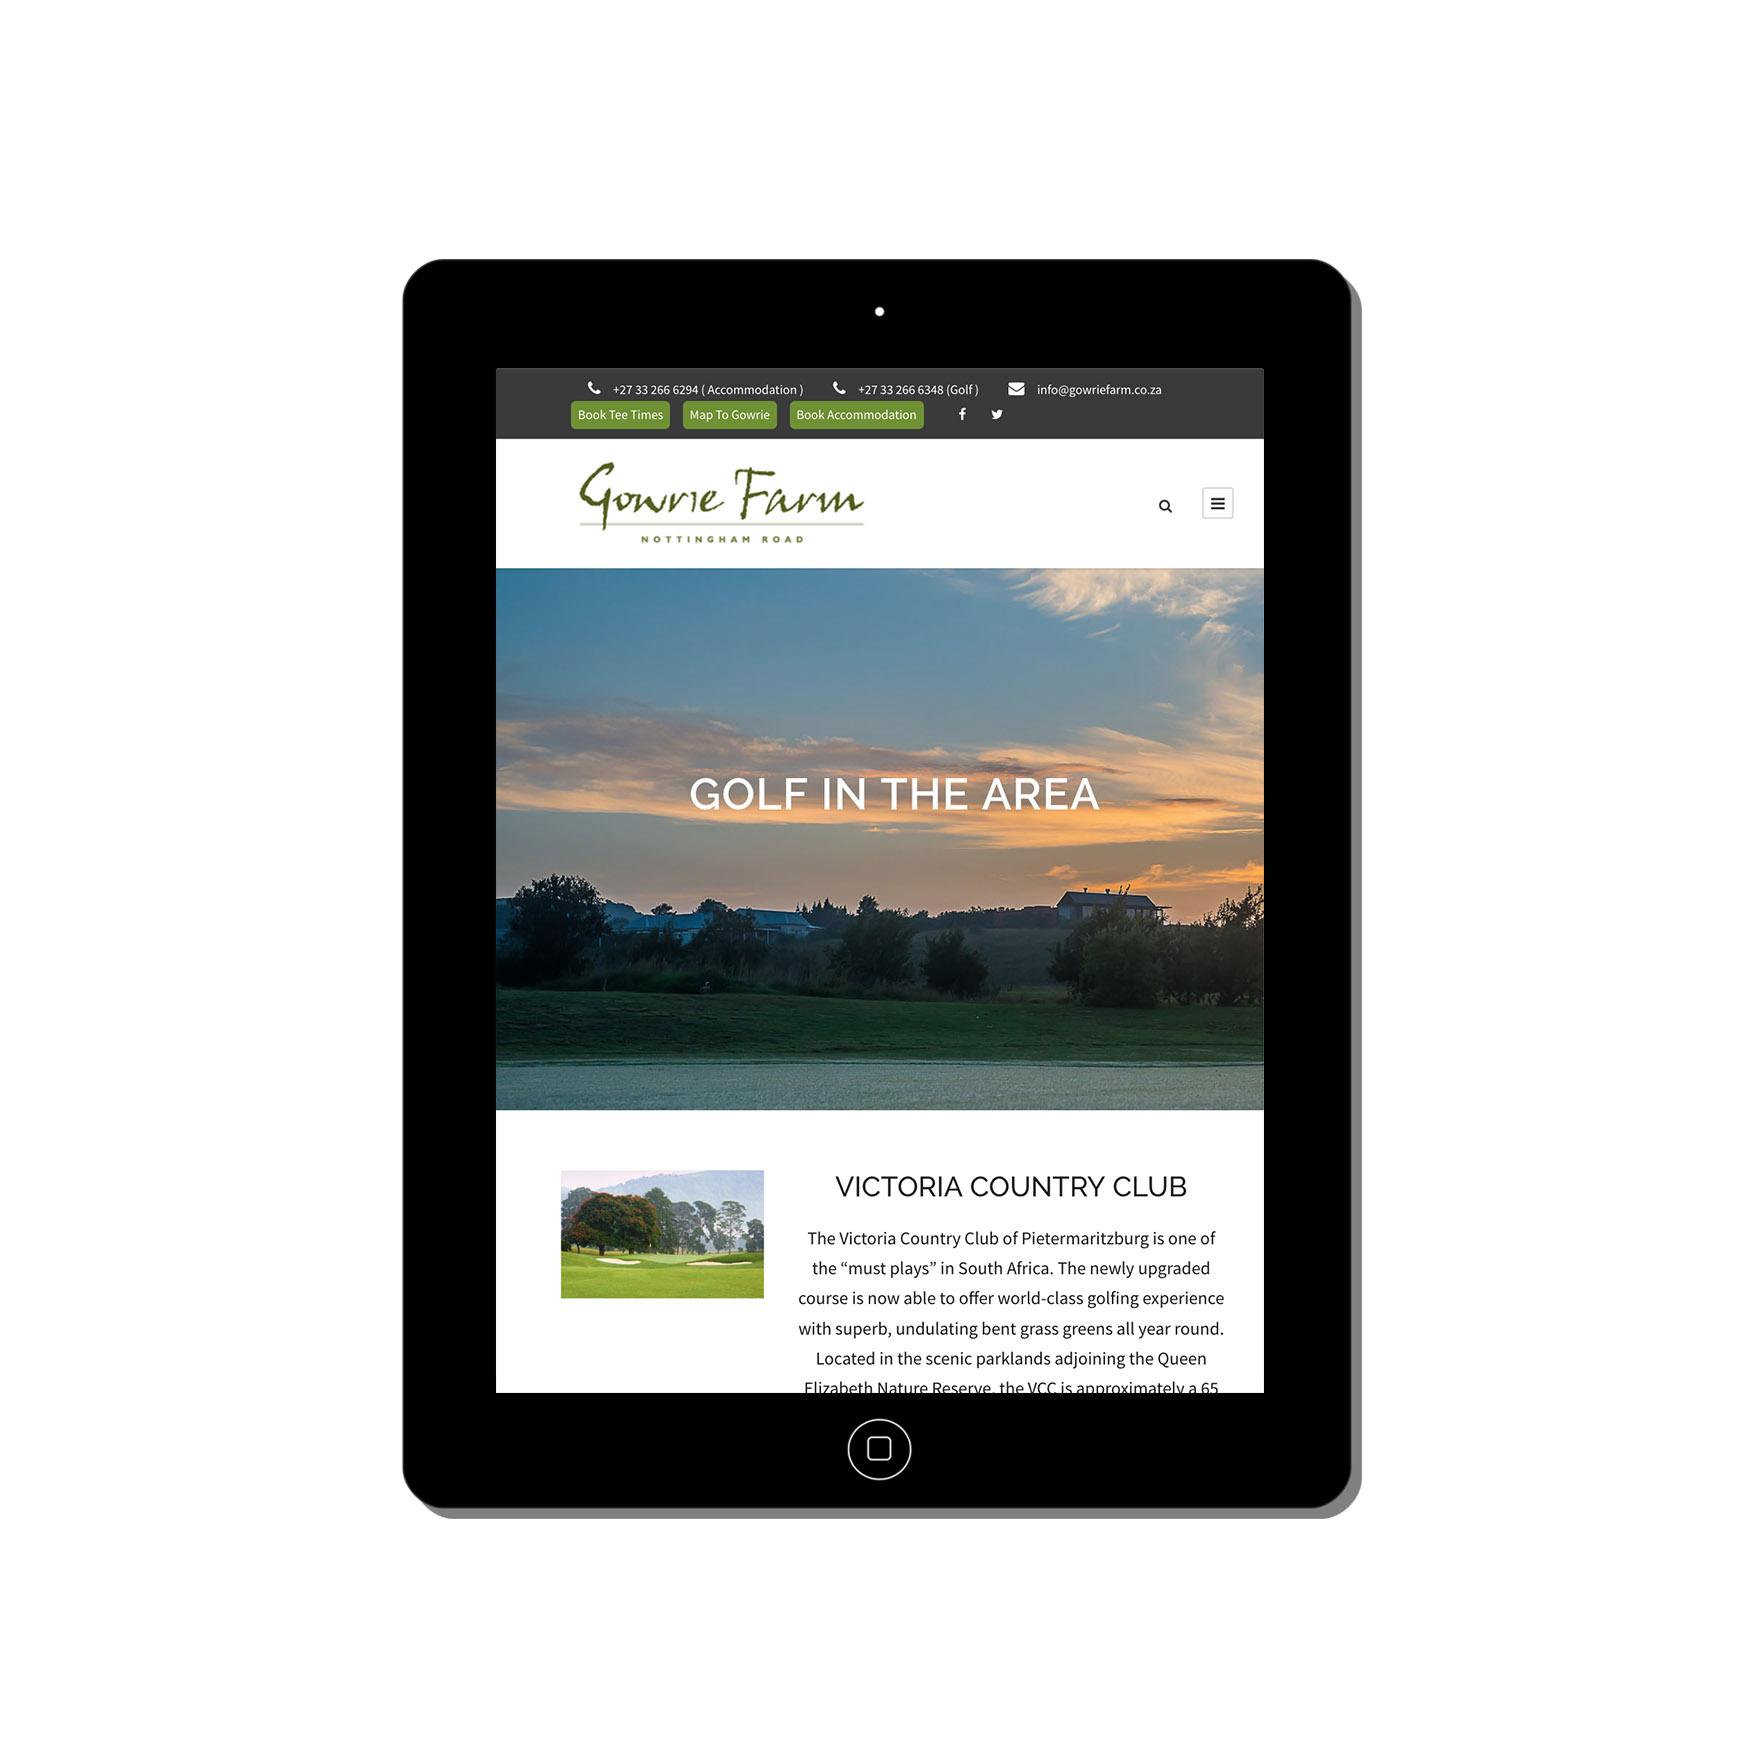 gowrie farm web-design-portfolio-webdoor-responsive-web-design-agency-hillcrest-kwazulu-natal-tablet